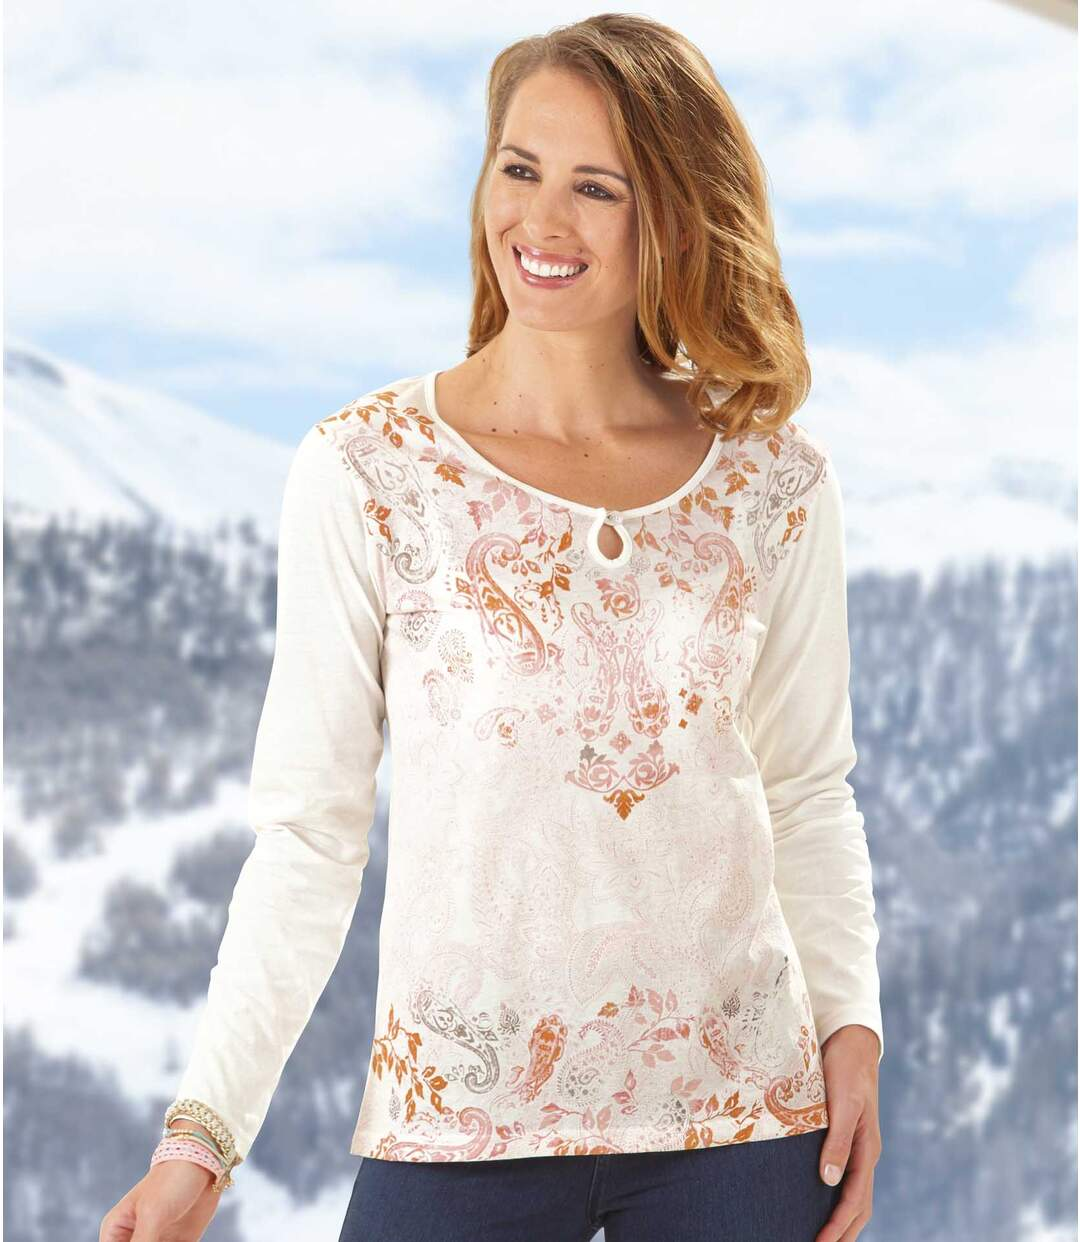 Women's White Fashionable Long Sleeve Top